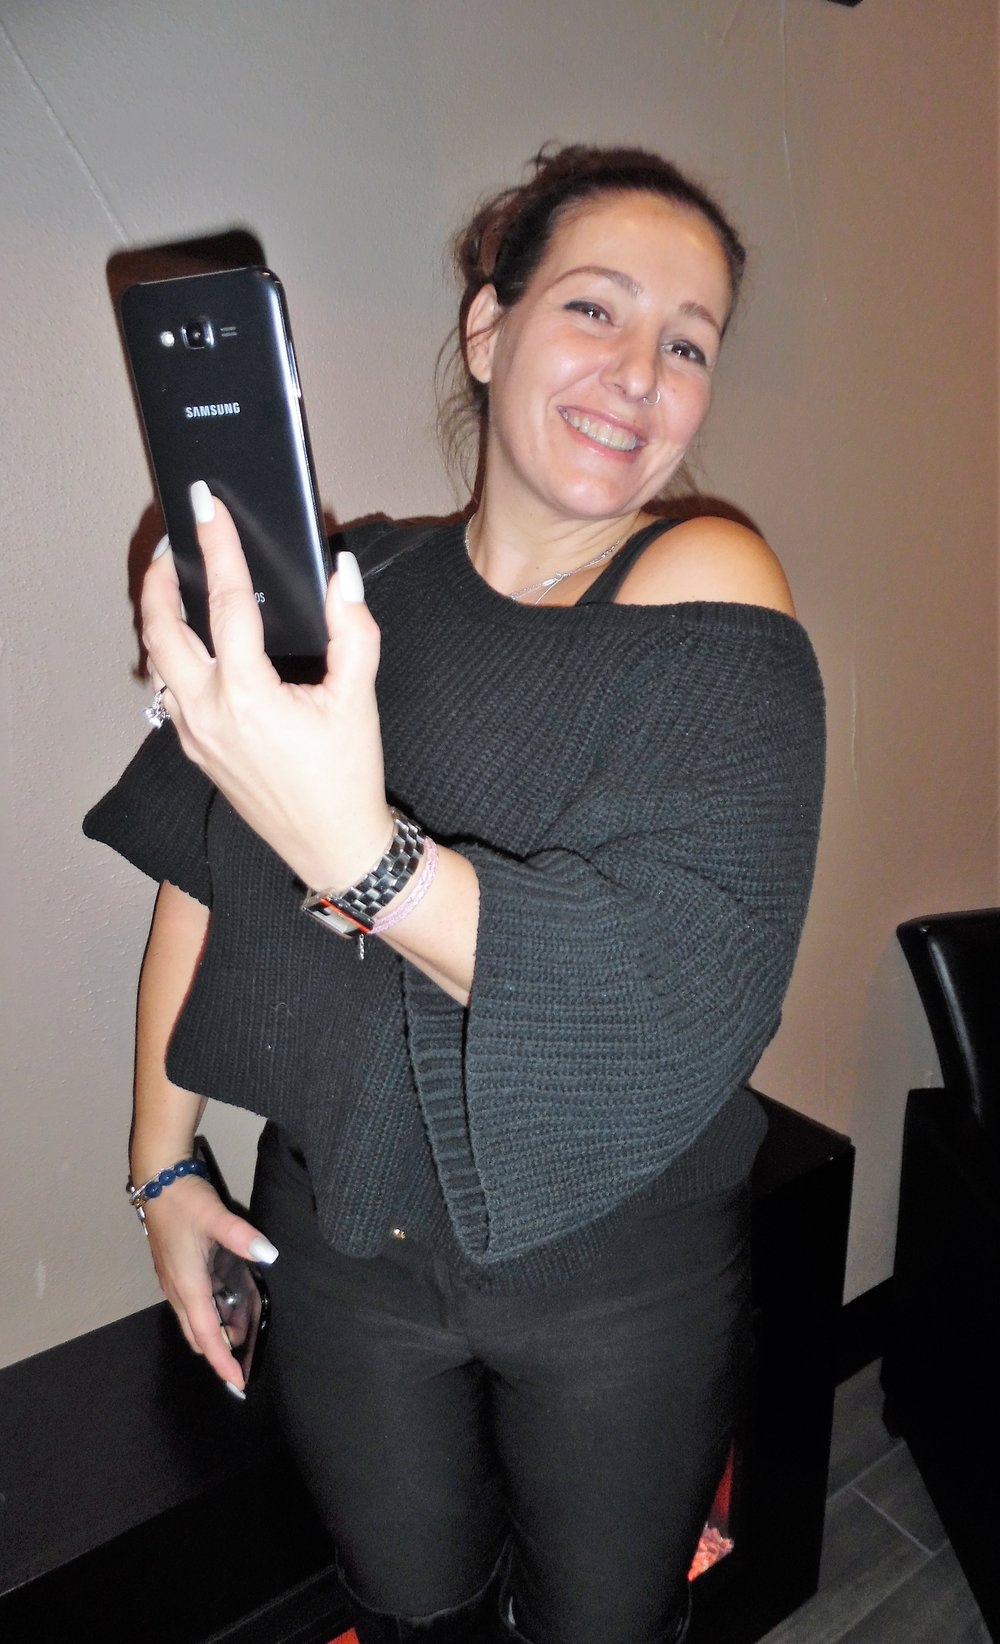 ETA  Bruno Nesci 's fiancée, Mary Passero recording Bruno's Flamboro show.